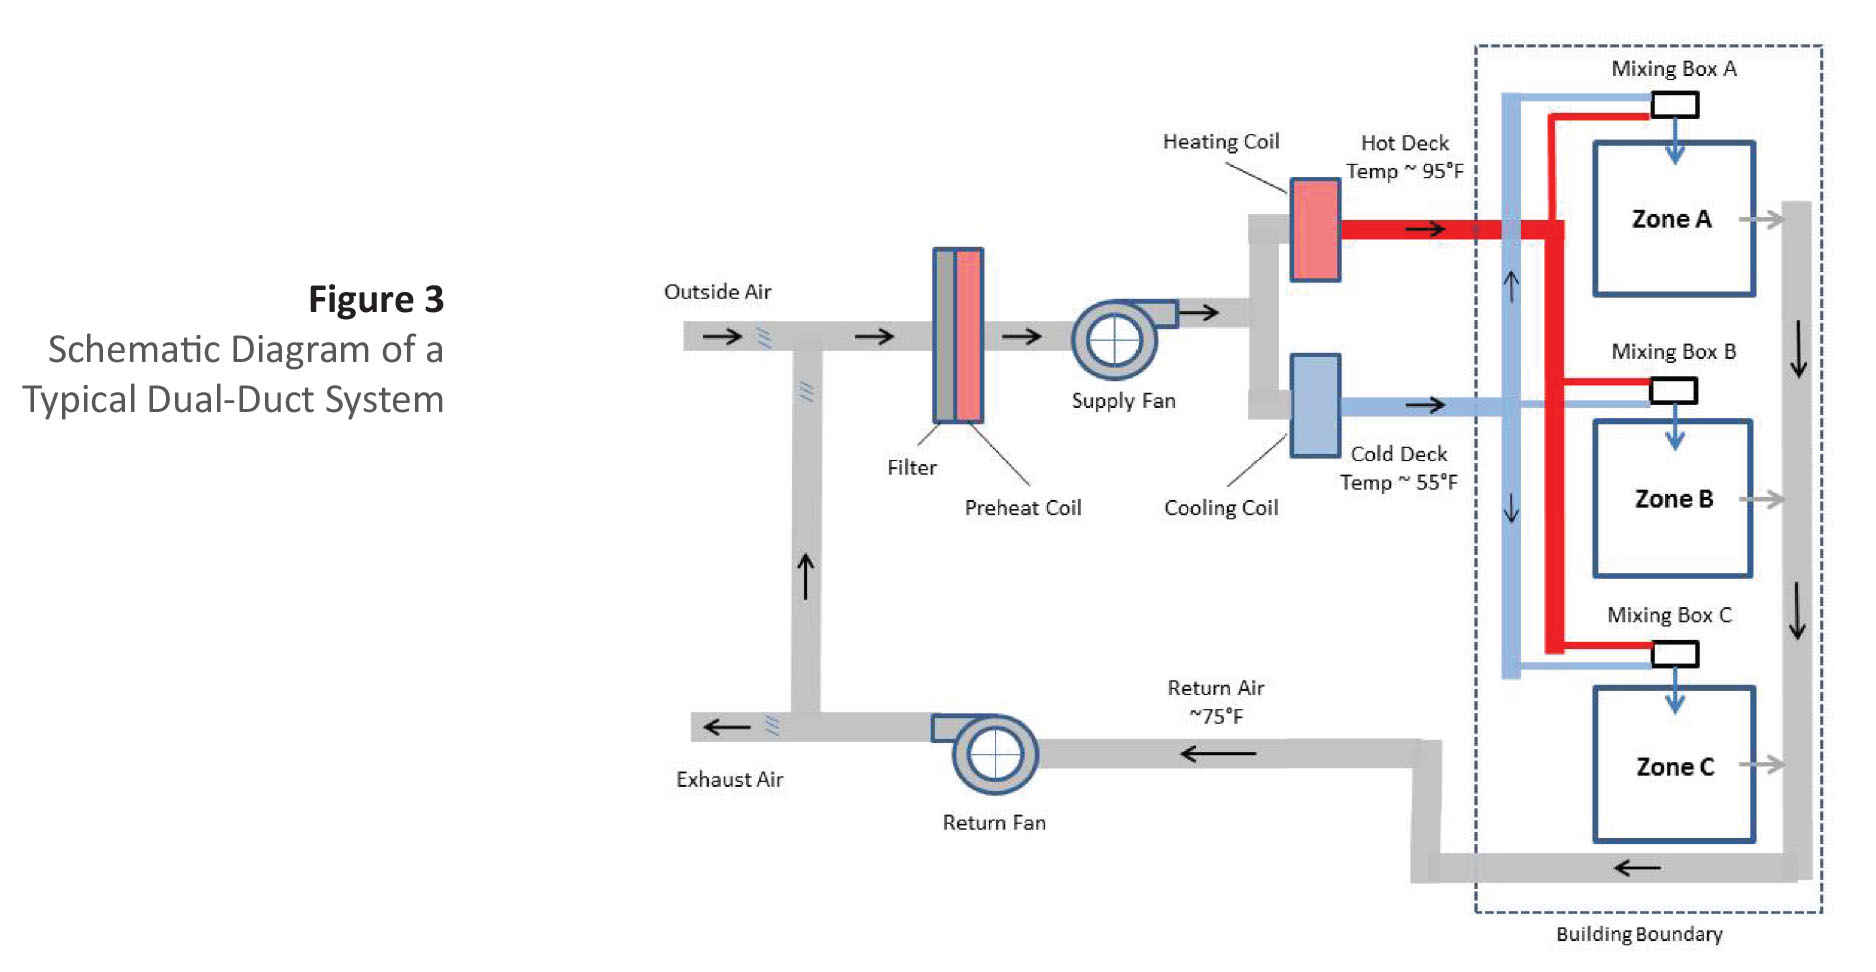 Central Air Split System